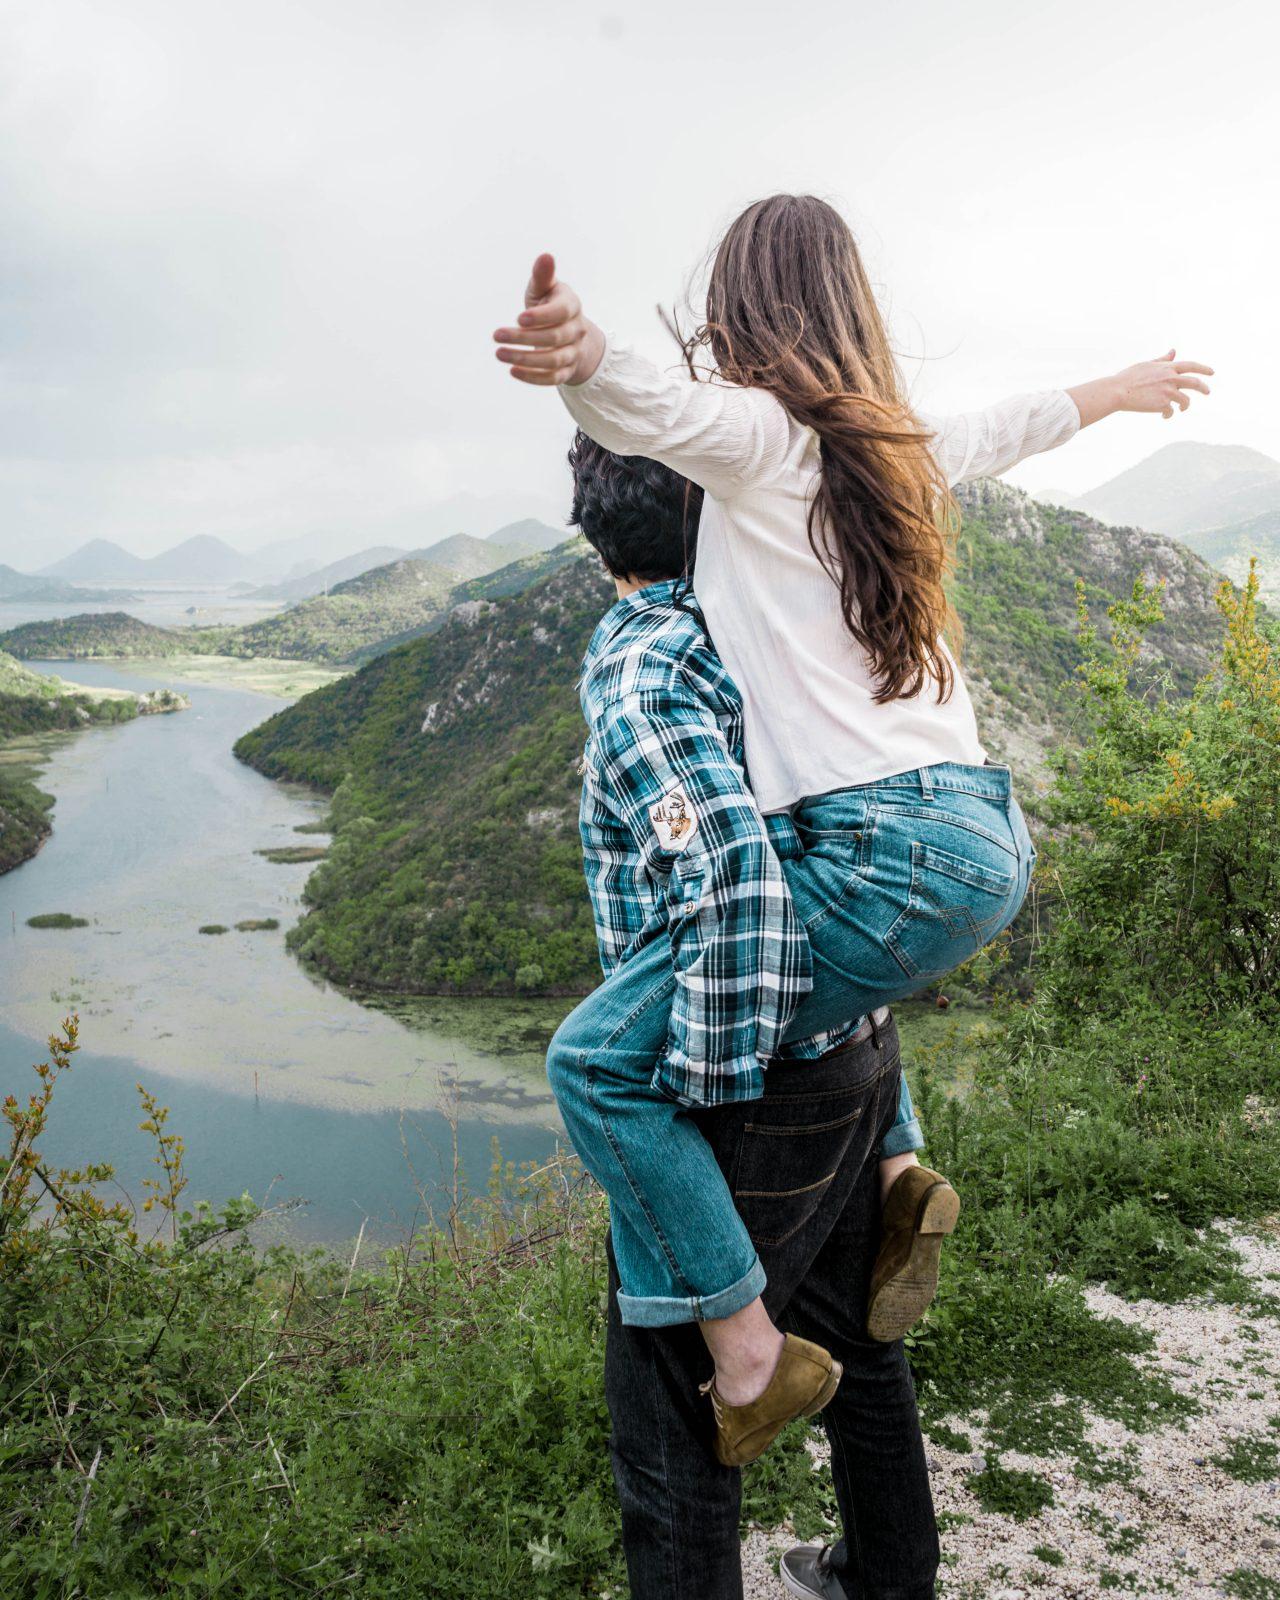 Zsuzi i Dante iz Beča razoružani ljepotom Crne Gore: Zemlja kao razglednica!